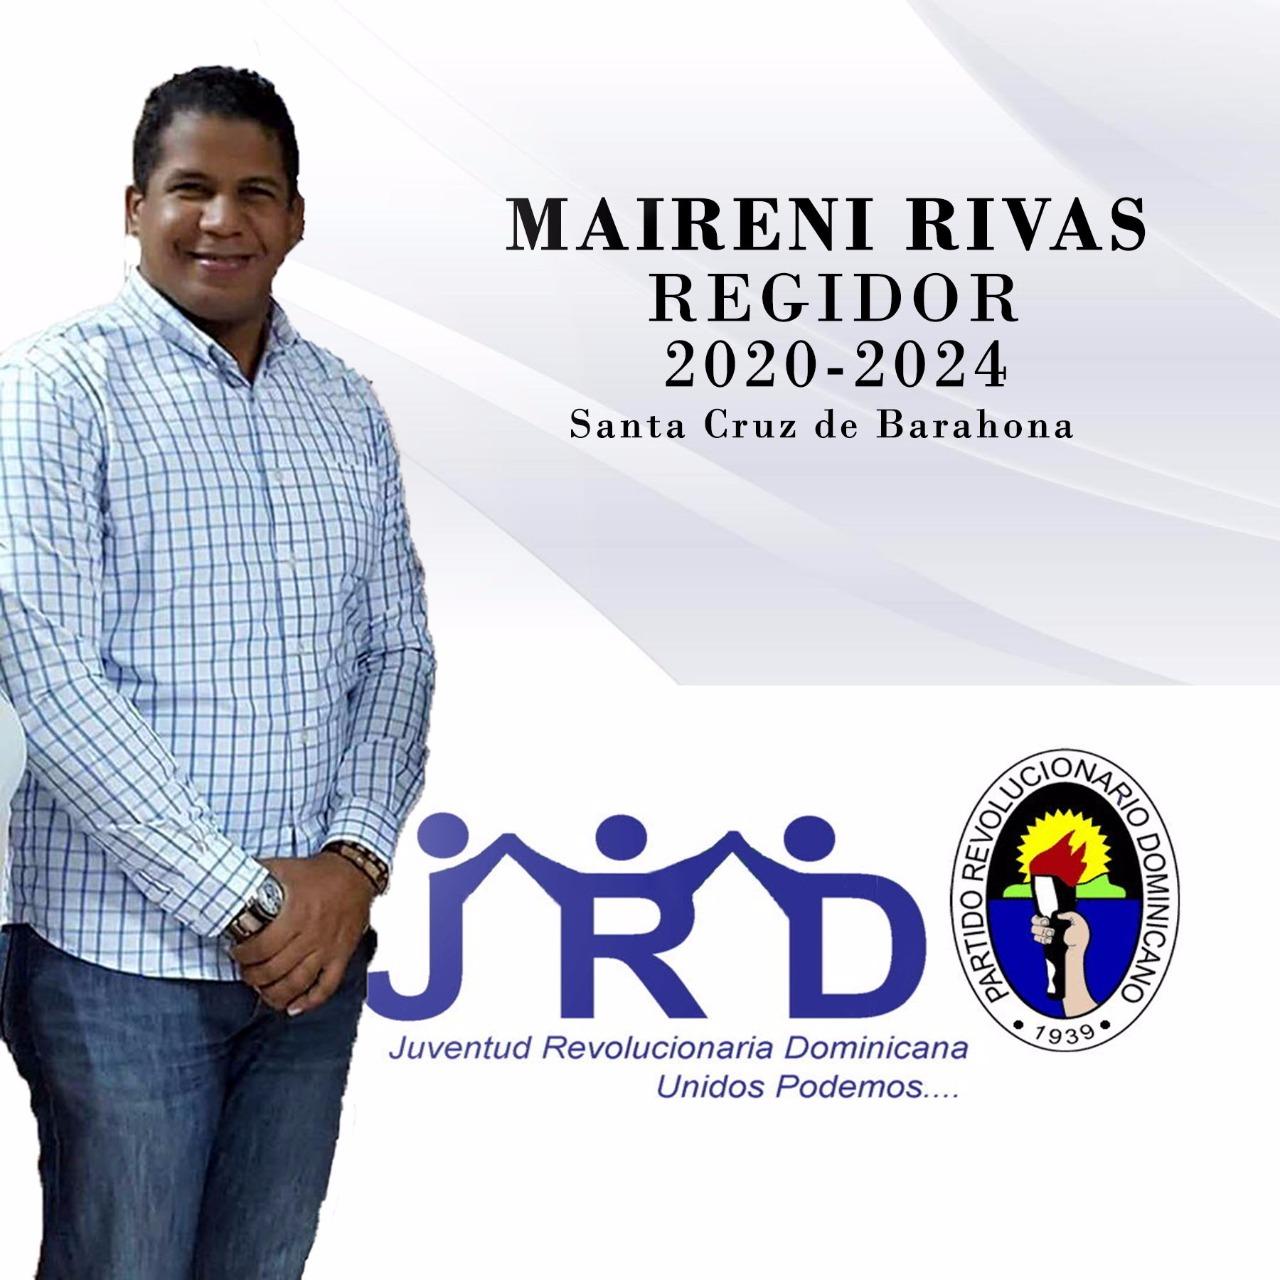 MAIRENI RIVAS REGIDOR 2020- 2024